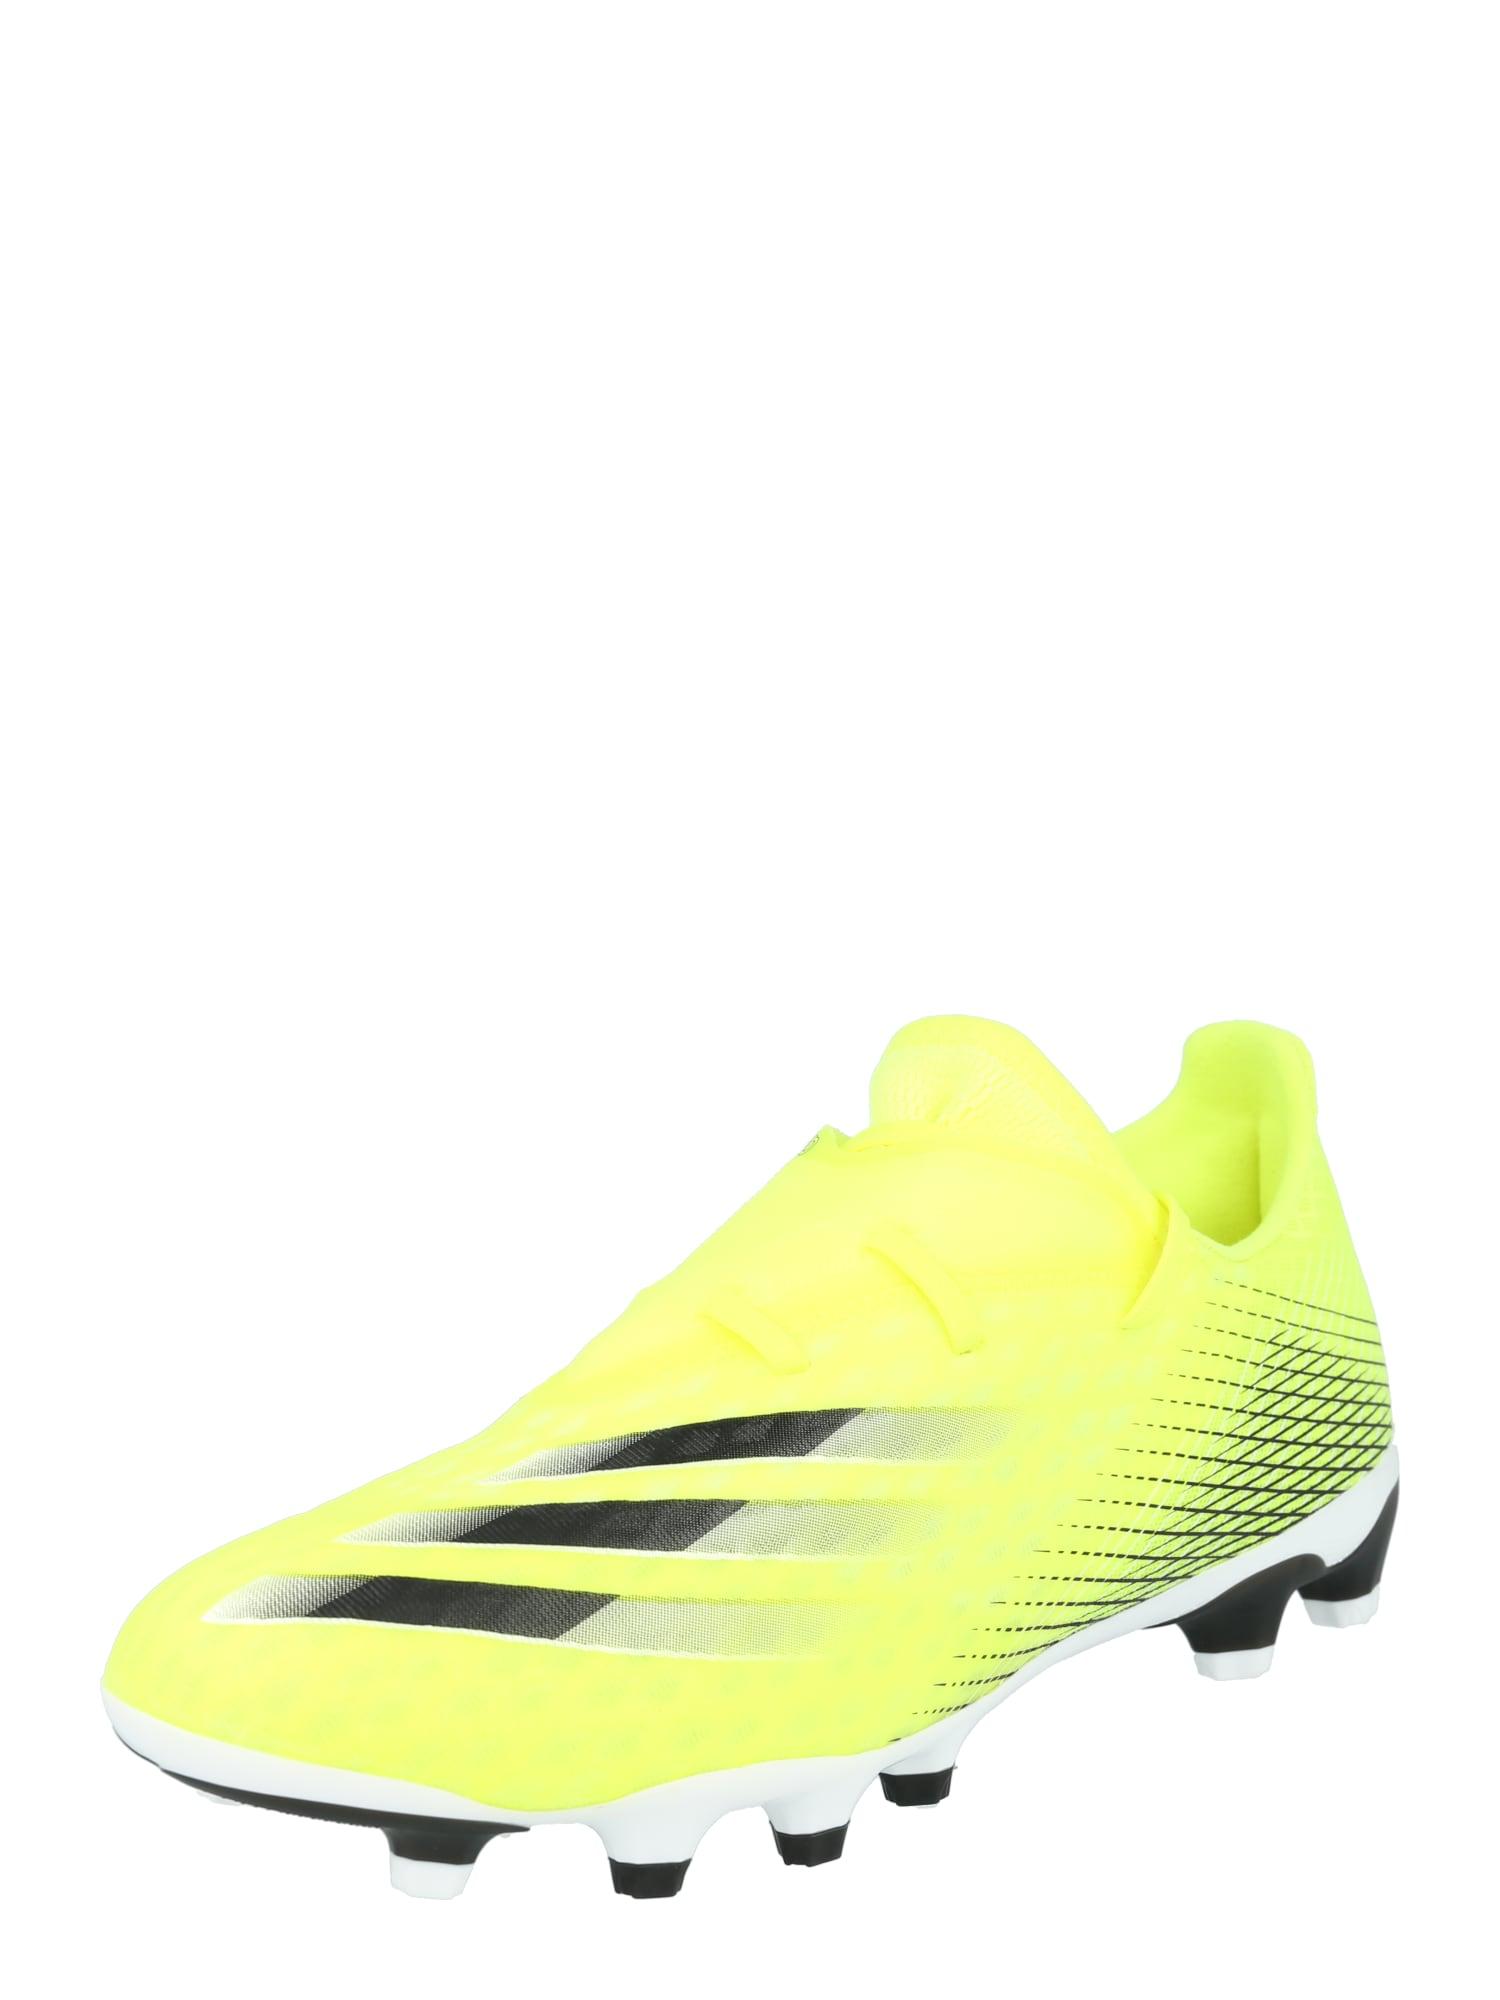 ADIDAS PERFORMANCE Futbolo bateliai geltona / balta / juoda